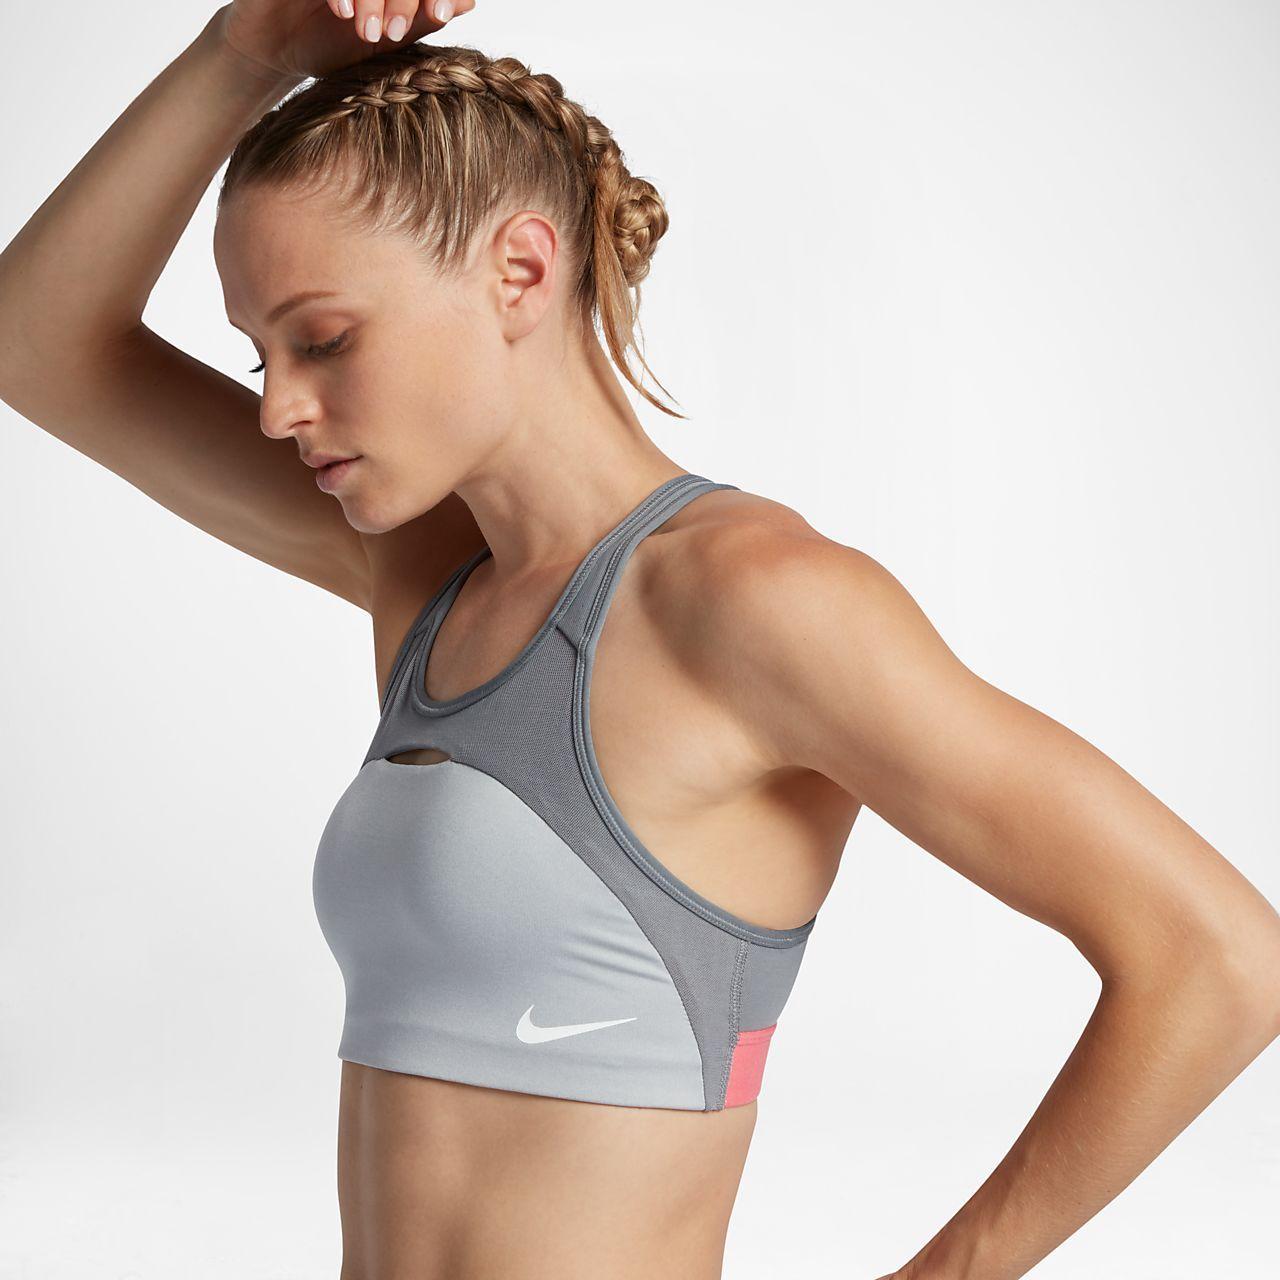 Nike Classic Swoosh Modern Women's Medium Support Sports